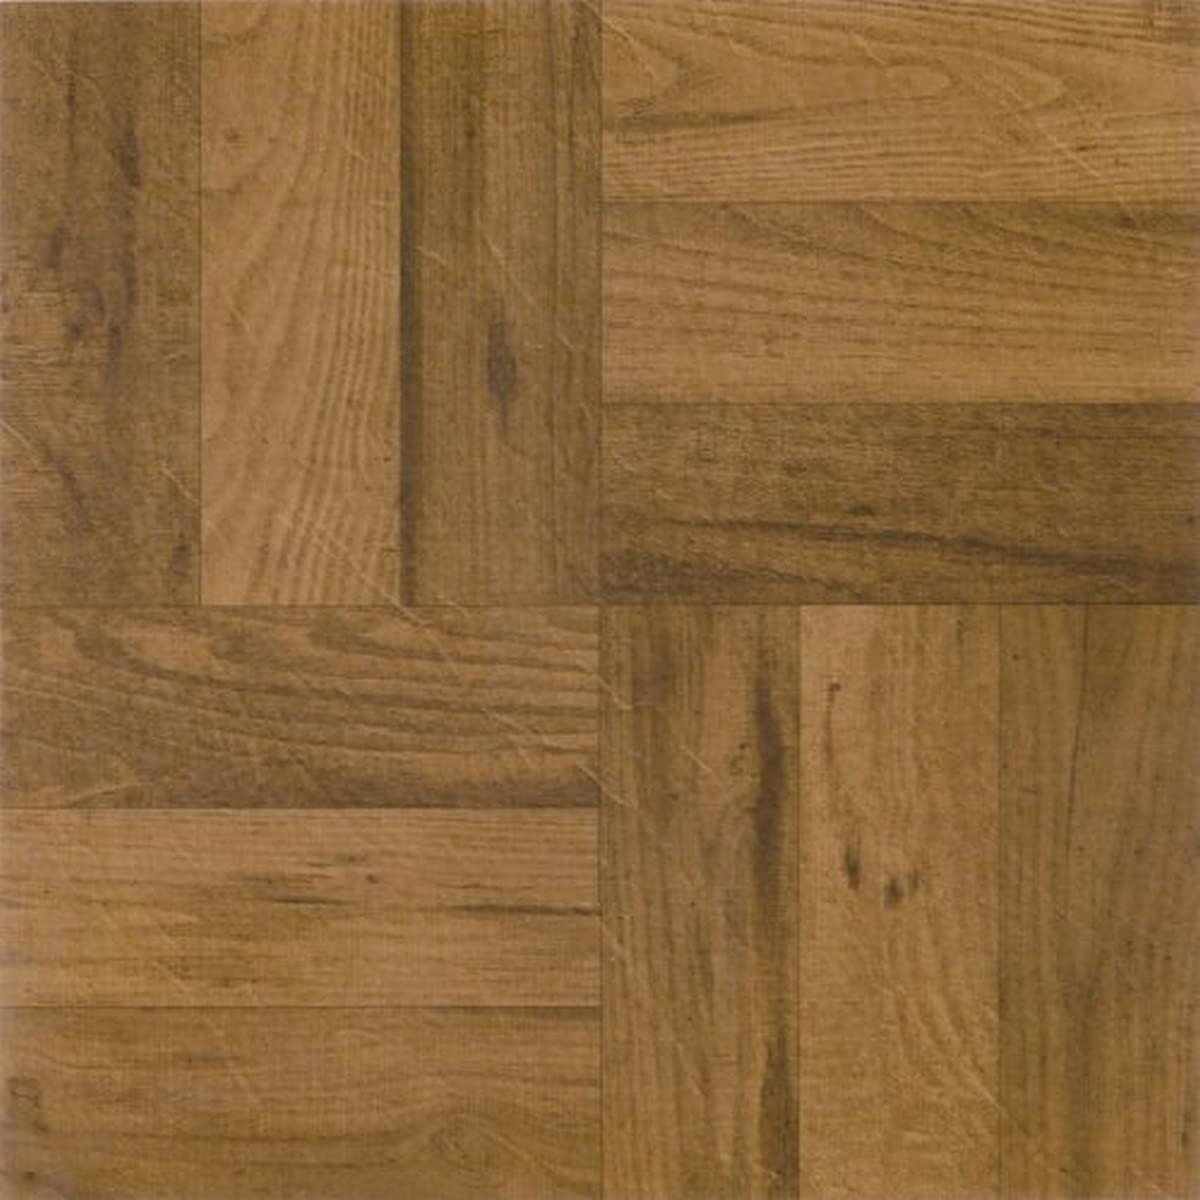 Translated Achim Home Furnishings FTVWD22520 Nexus supreme Vinyl 12-Inch Wood Tile